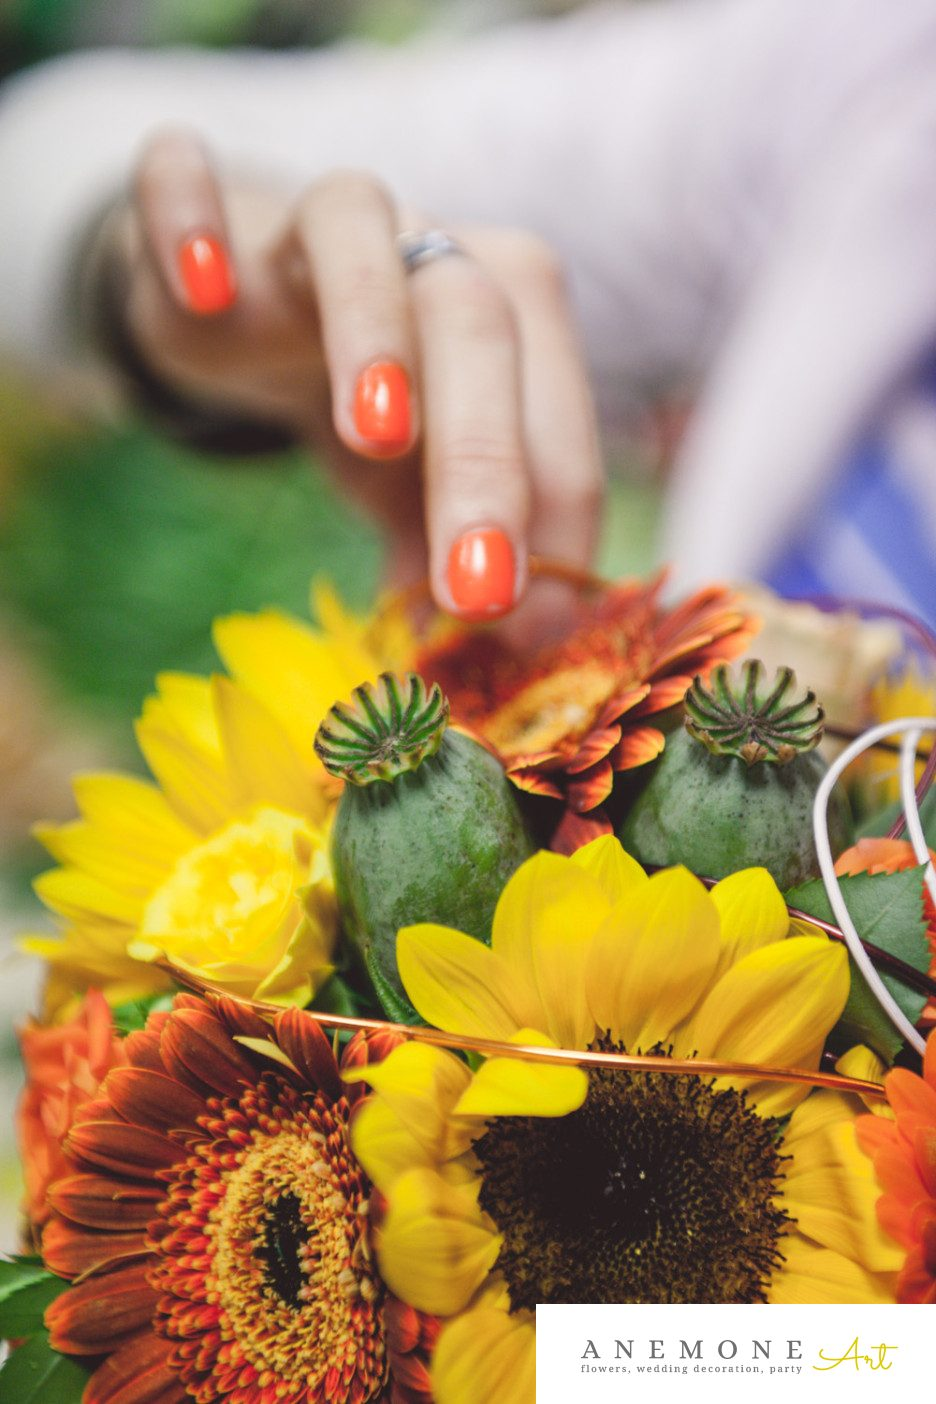 Poza, foto cu Flori de nunta buchet mireasa, celosia, craspedia, floarea soarelui, galben, maci, mini-gerbera, mini-rosa, portocaliu, trandafiri in Arad, Timisoara, Oradea (wedding flowers, bouquets) nunta Arad, Timisoara, Oradea